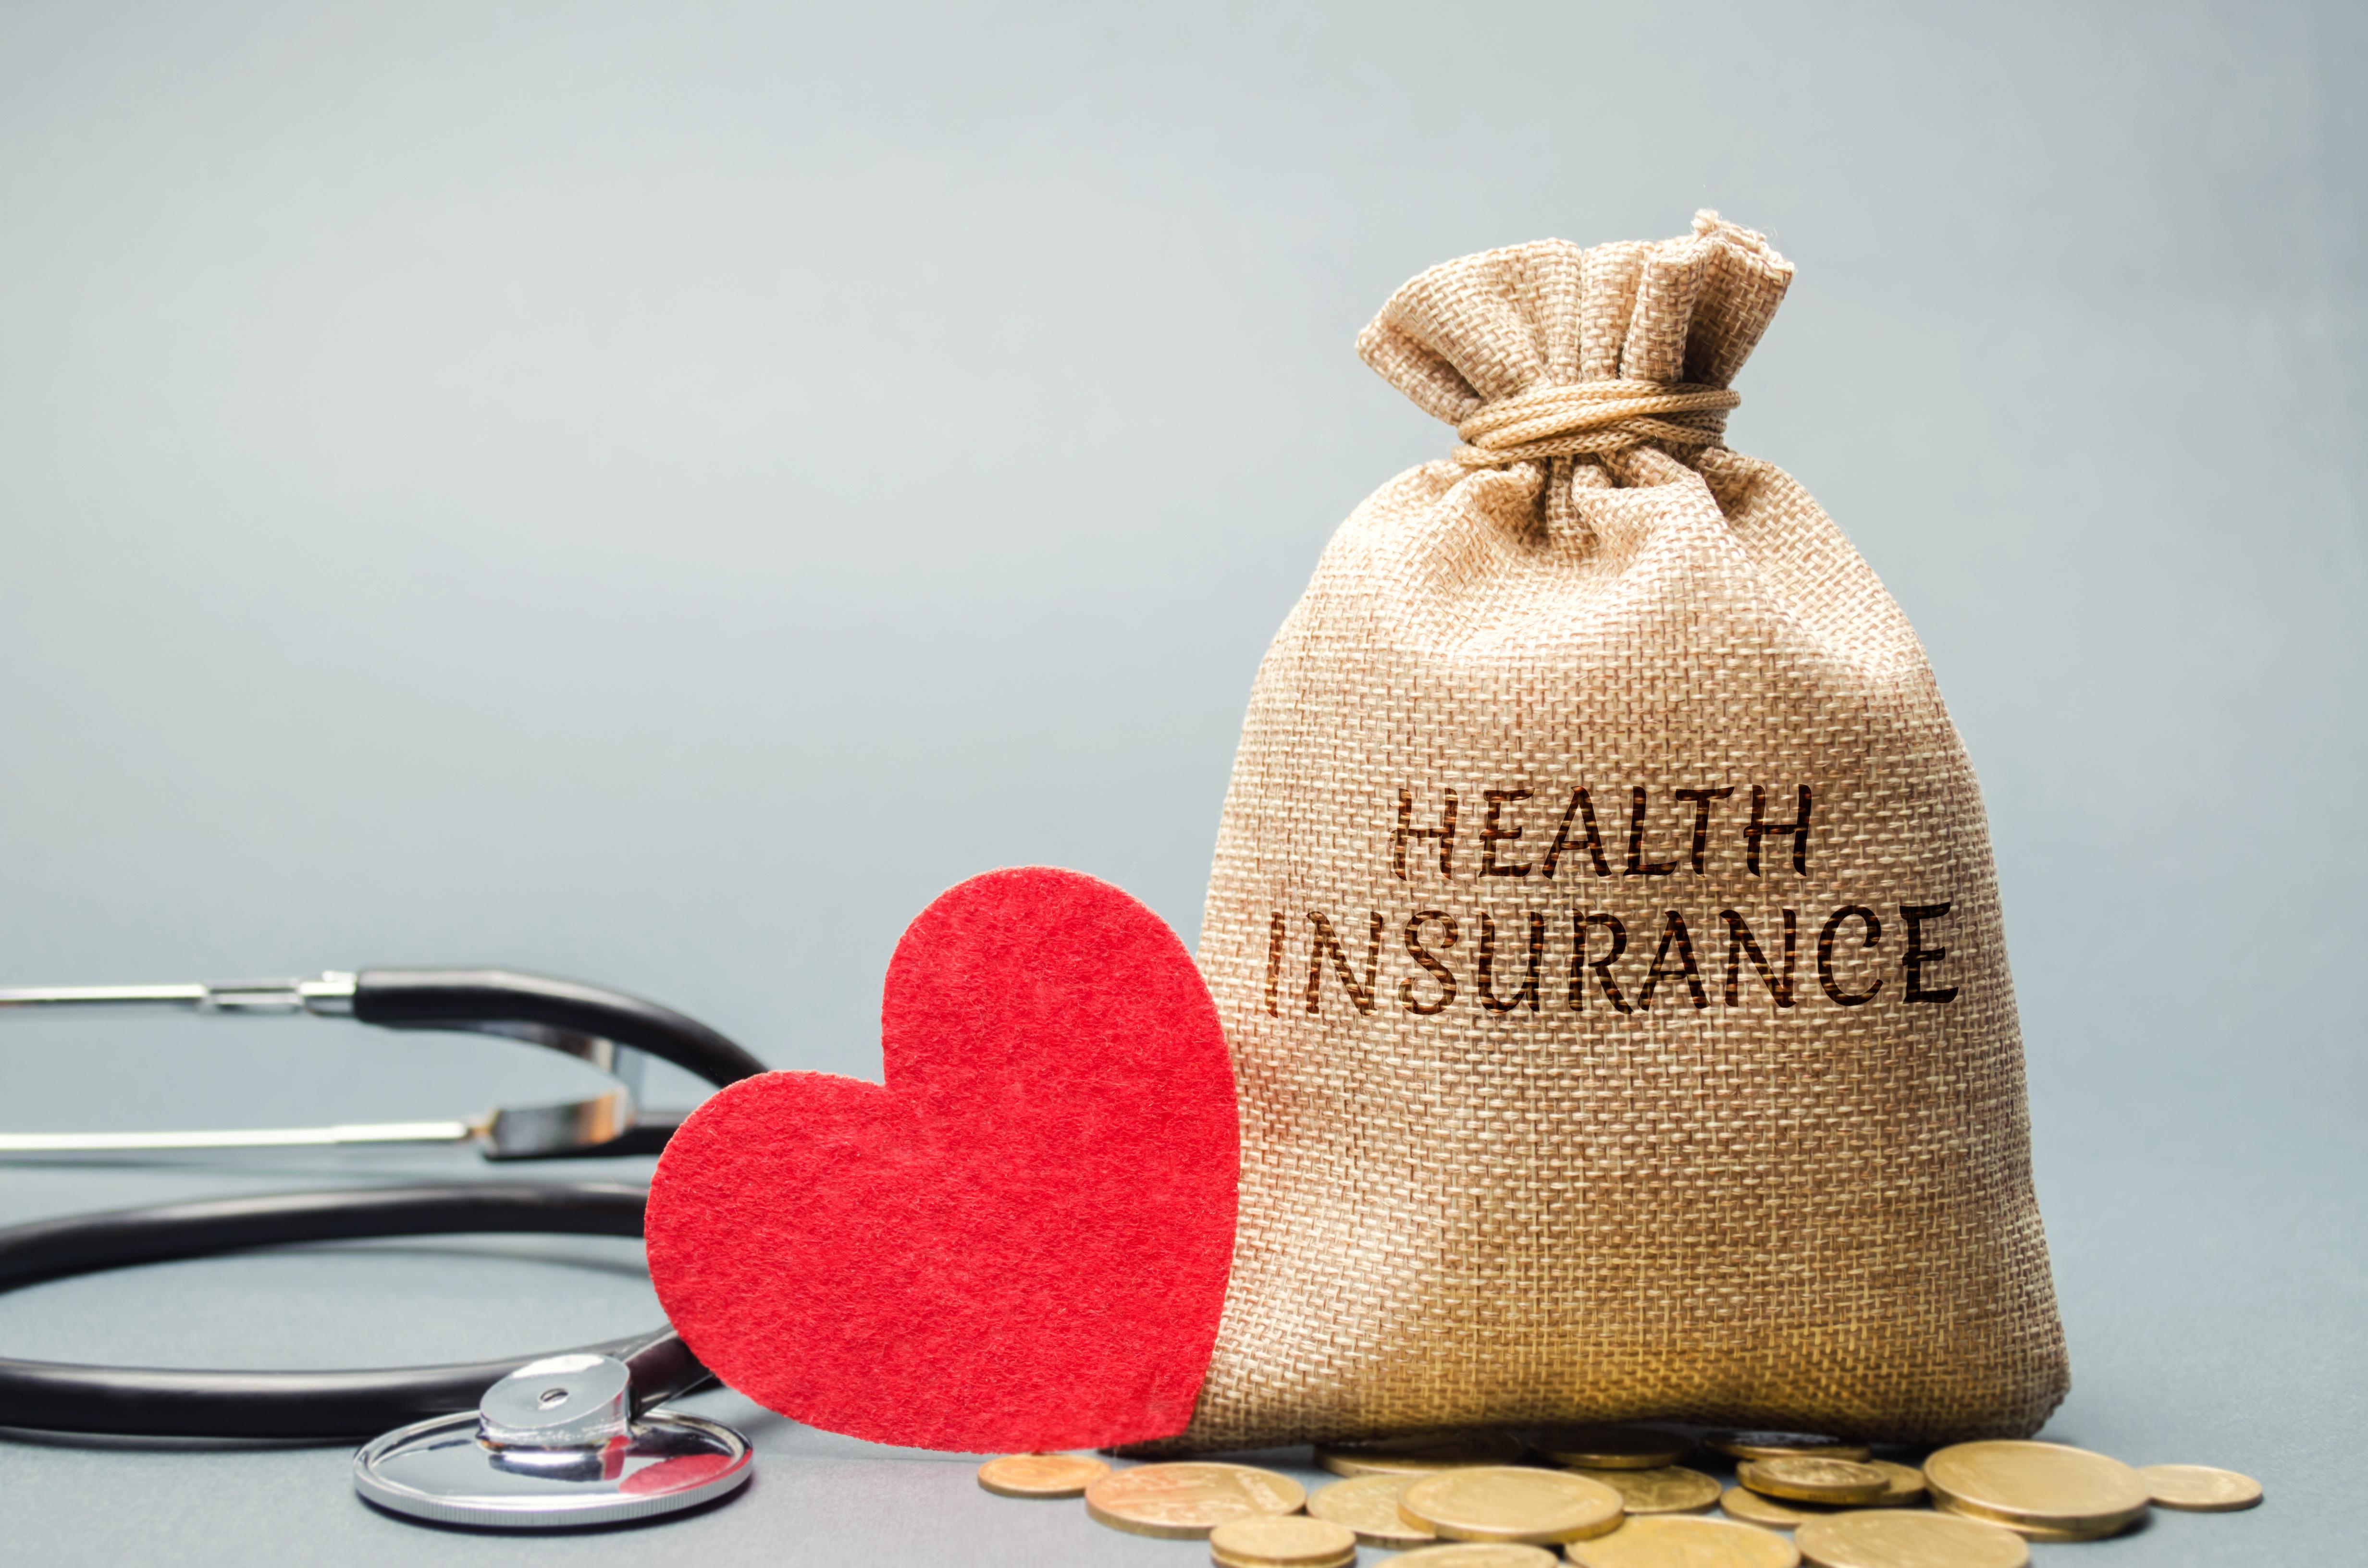 choosing health insurance